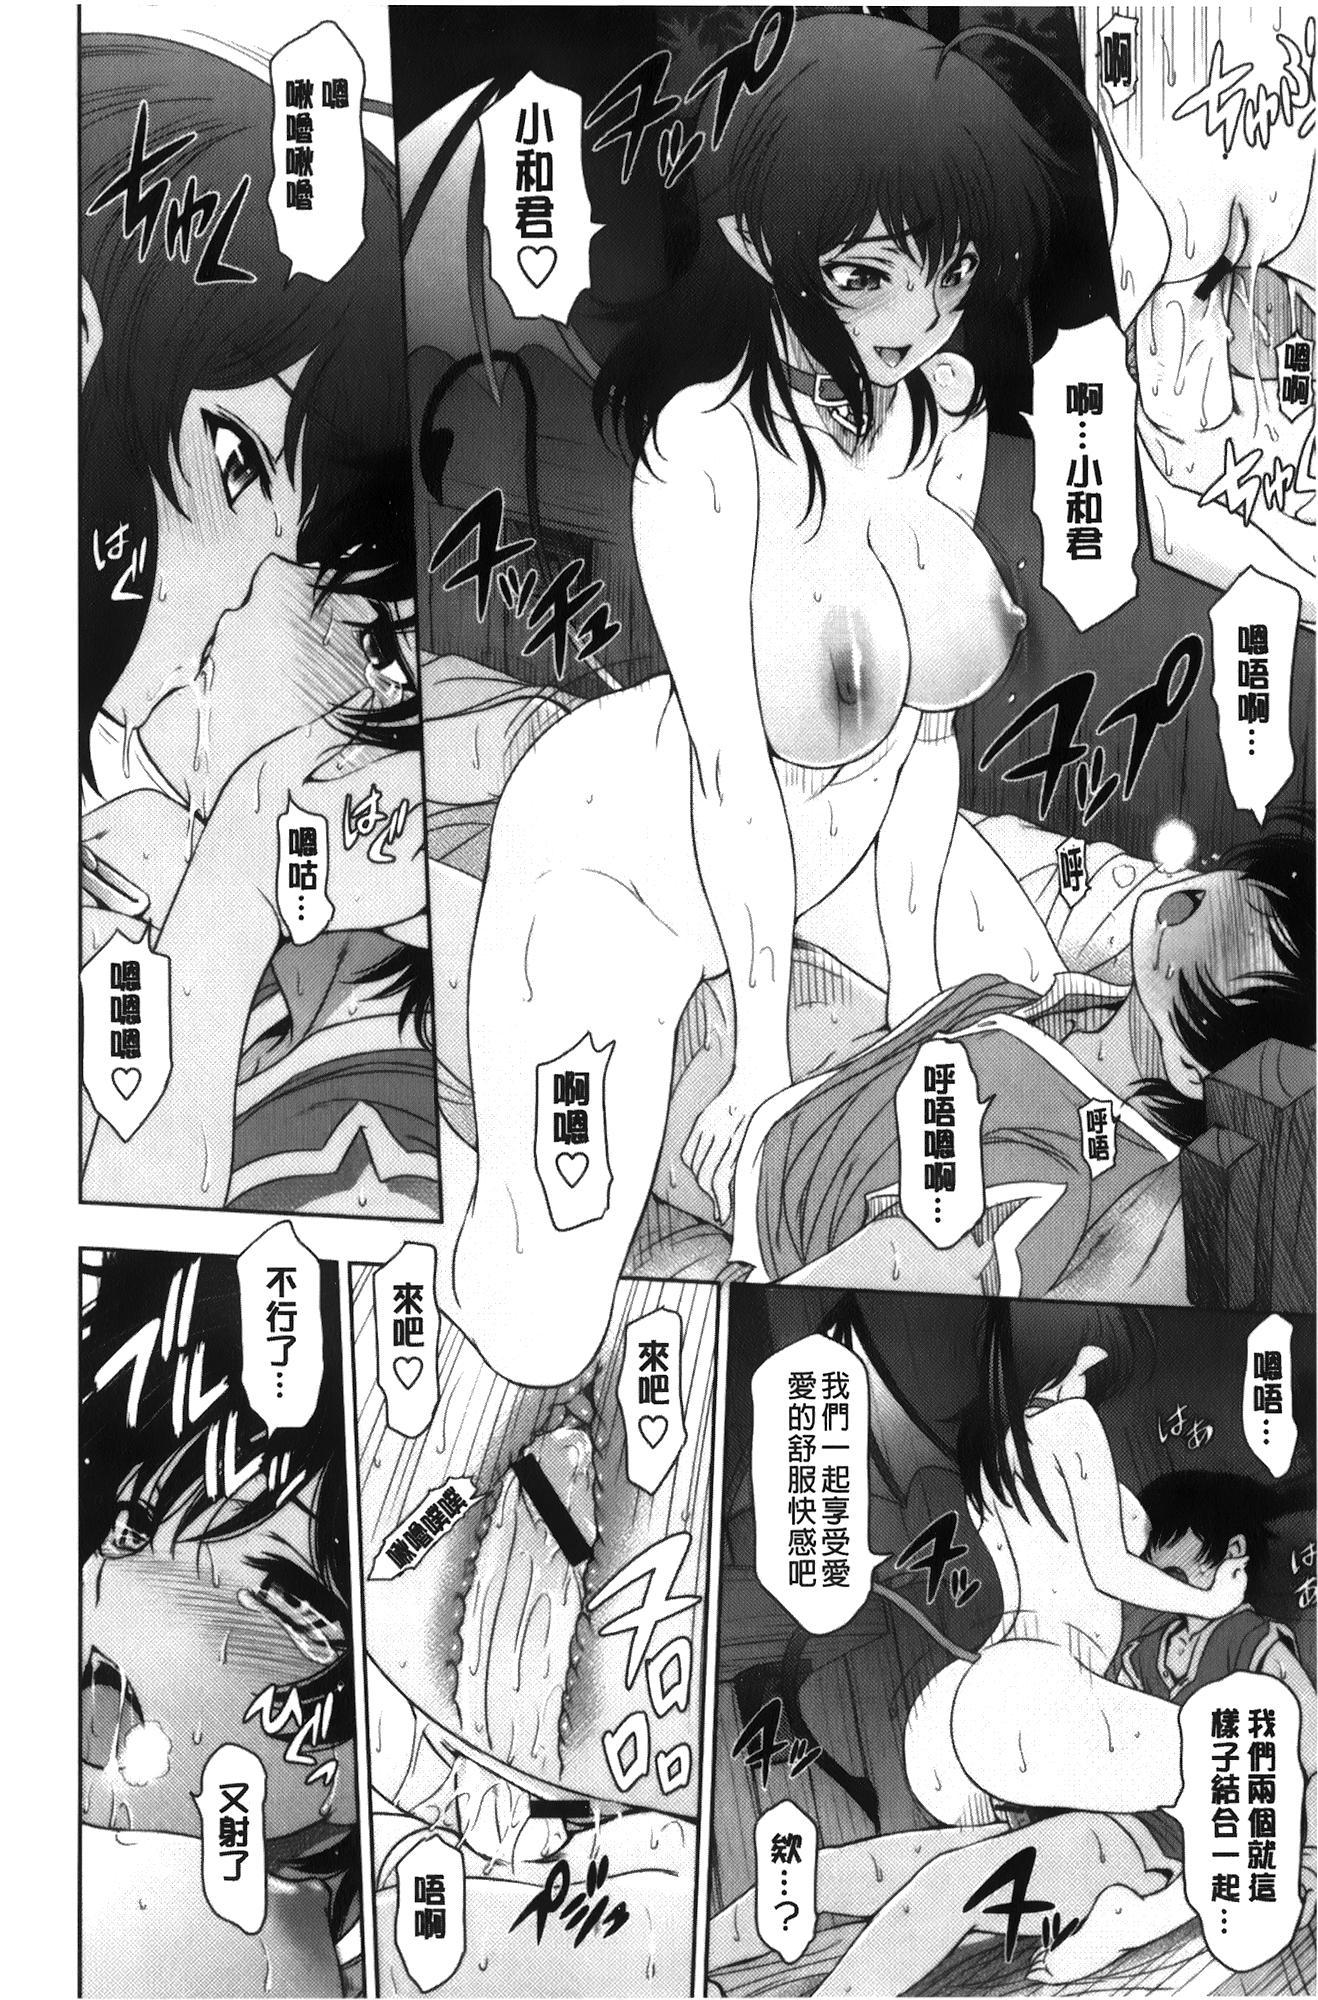 Majo × Shota ~ Genteiban | 魔女X小正太 限定版 46